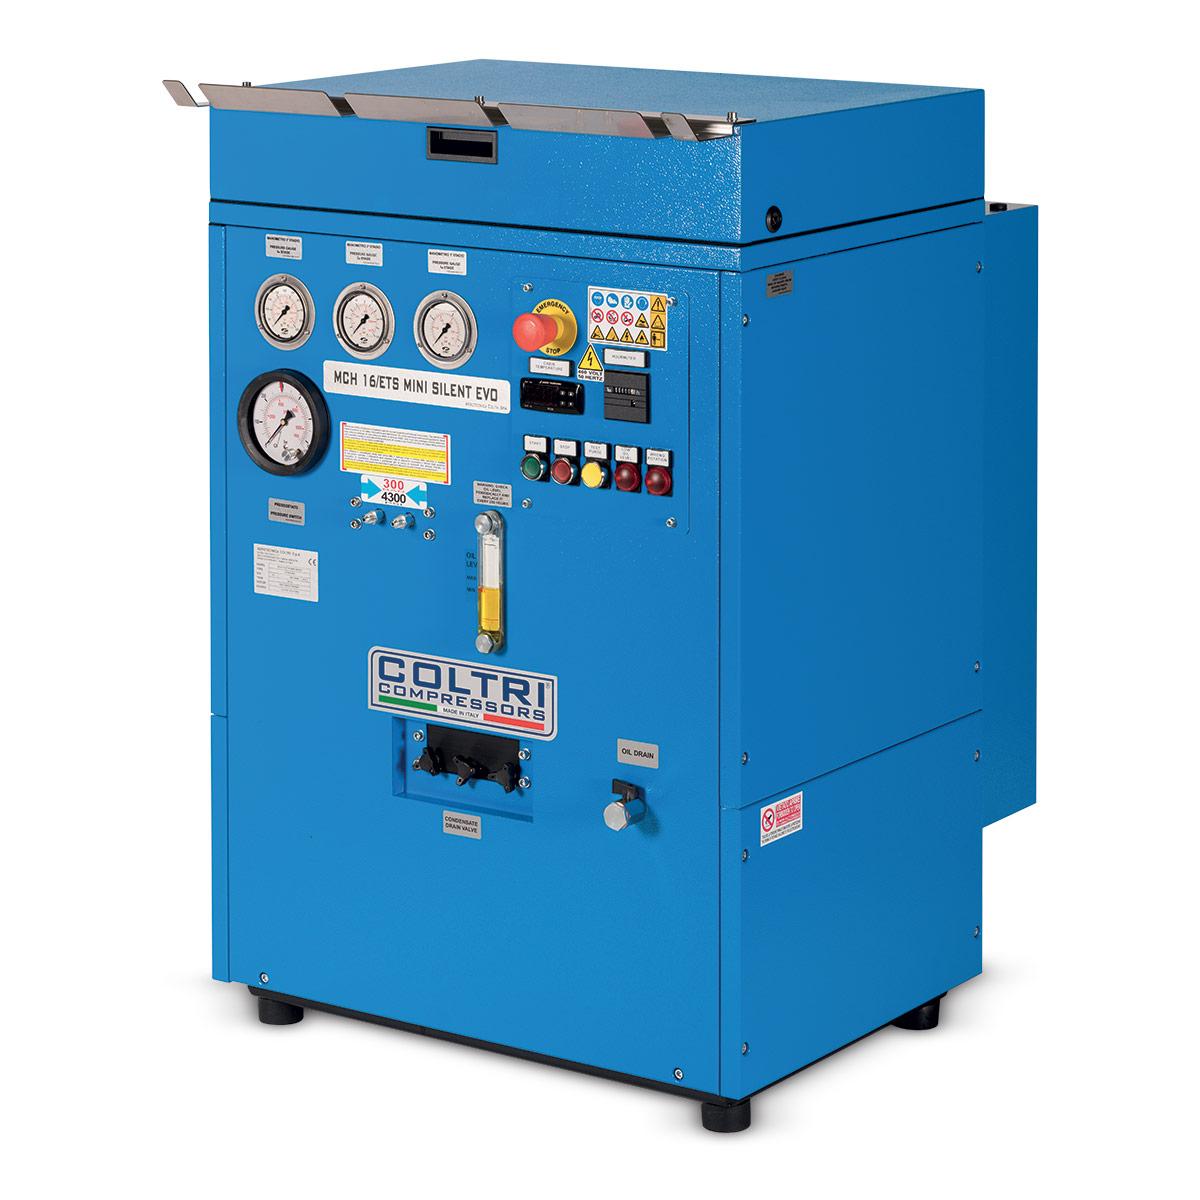 Тих водолазен компресор MCH 16 ETS MINI SILENT EVO 232 бара / 330 бара – Coltri